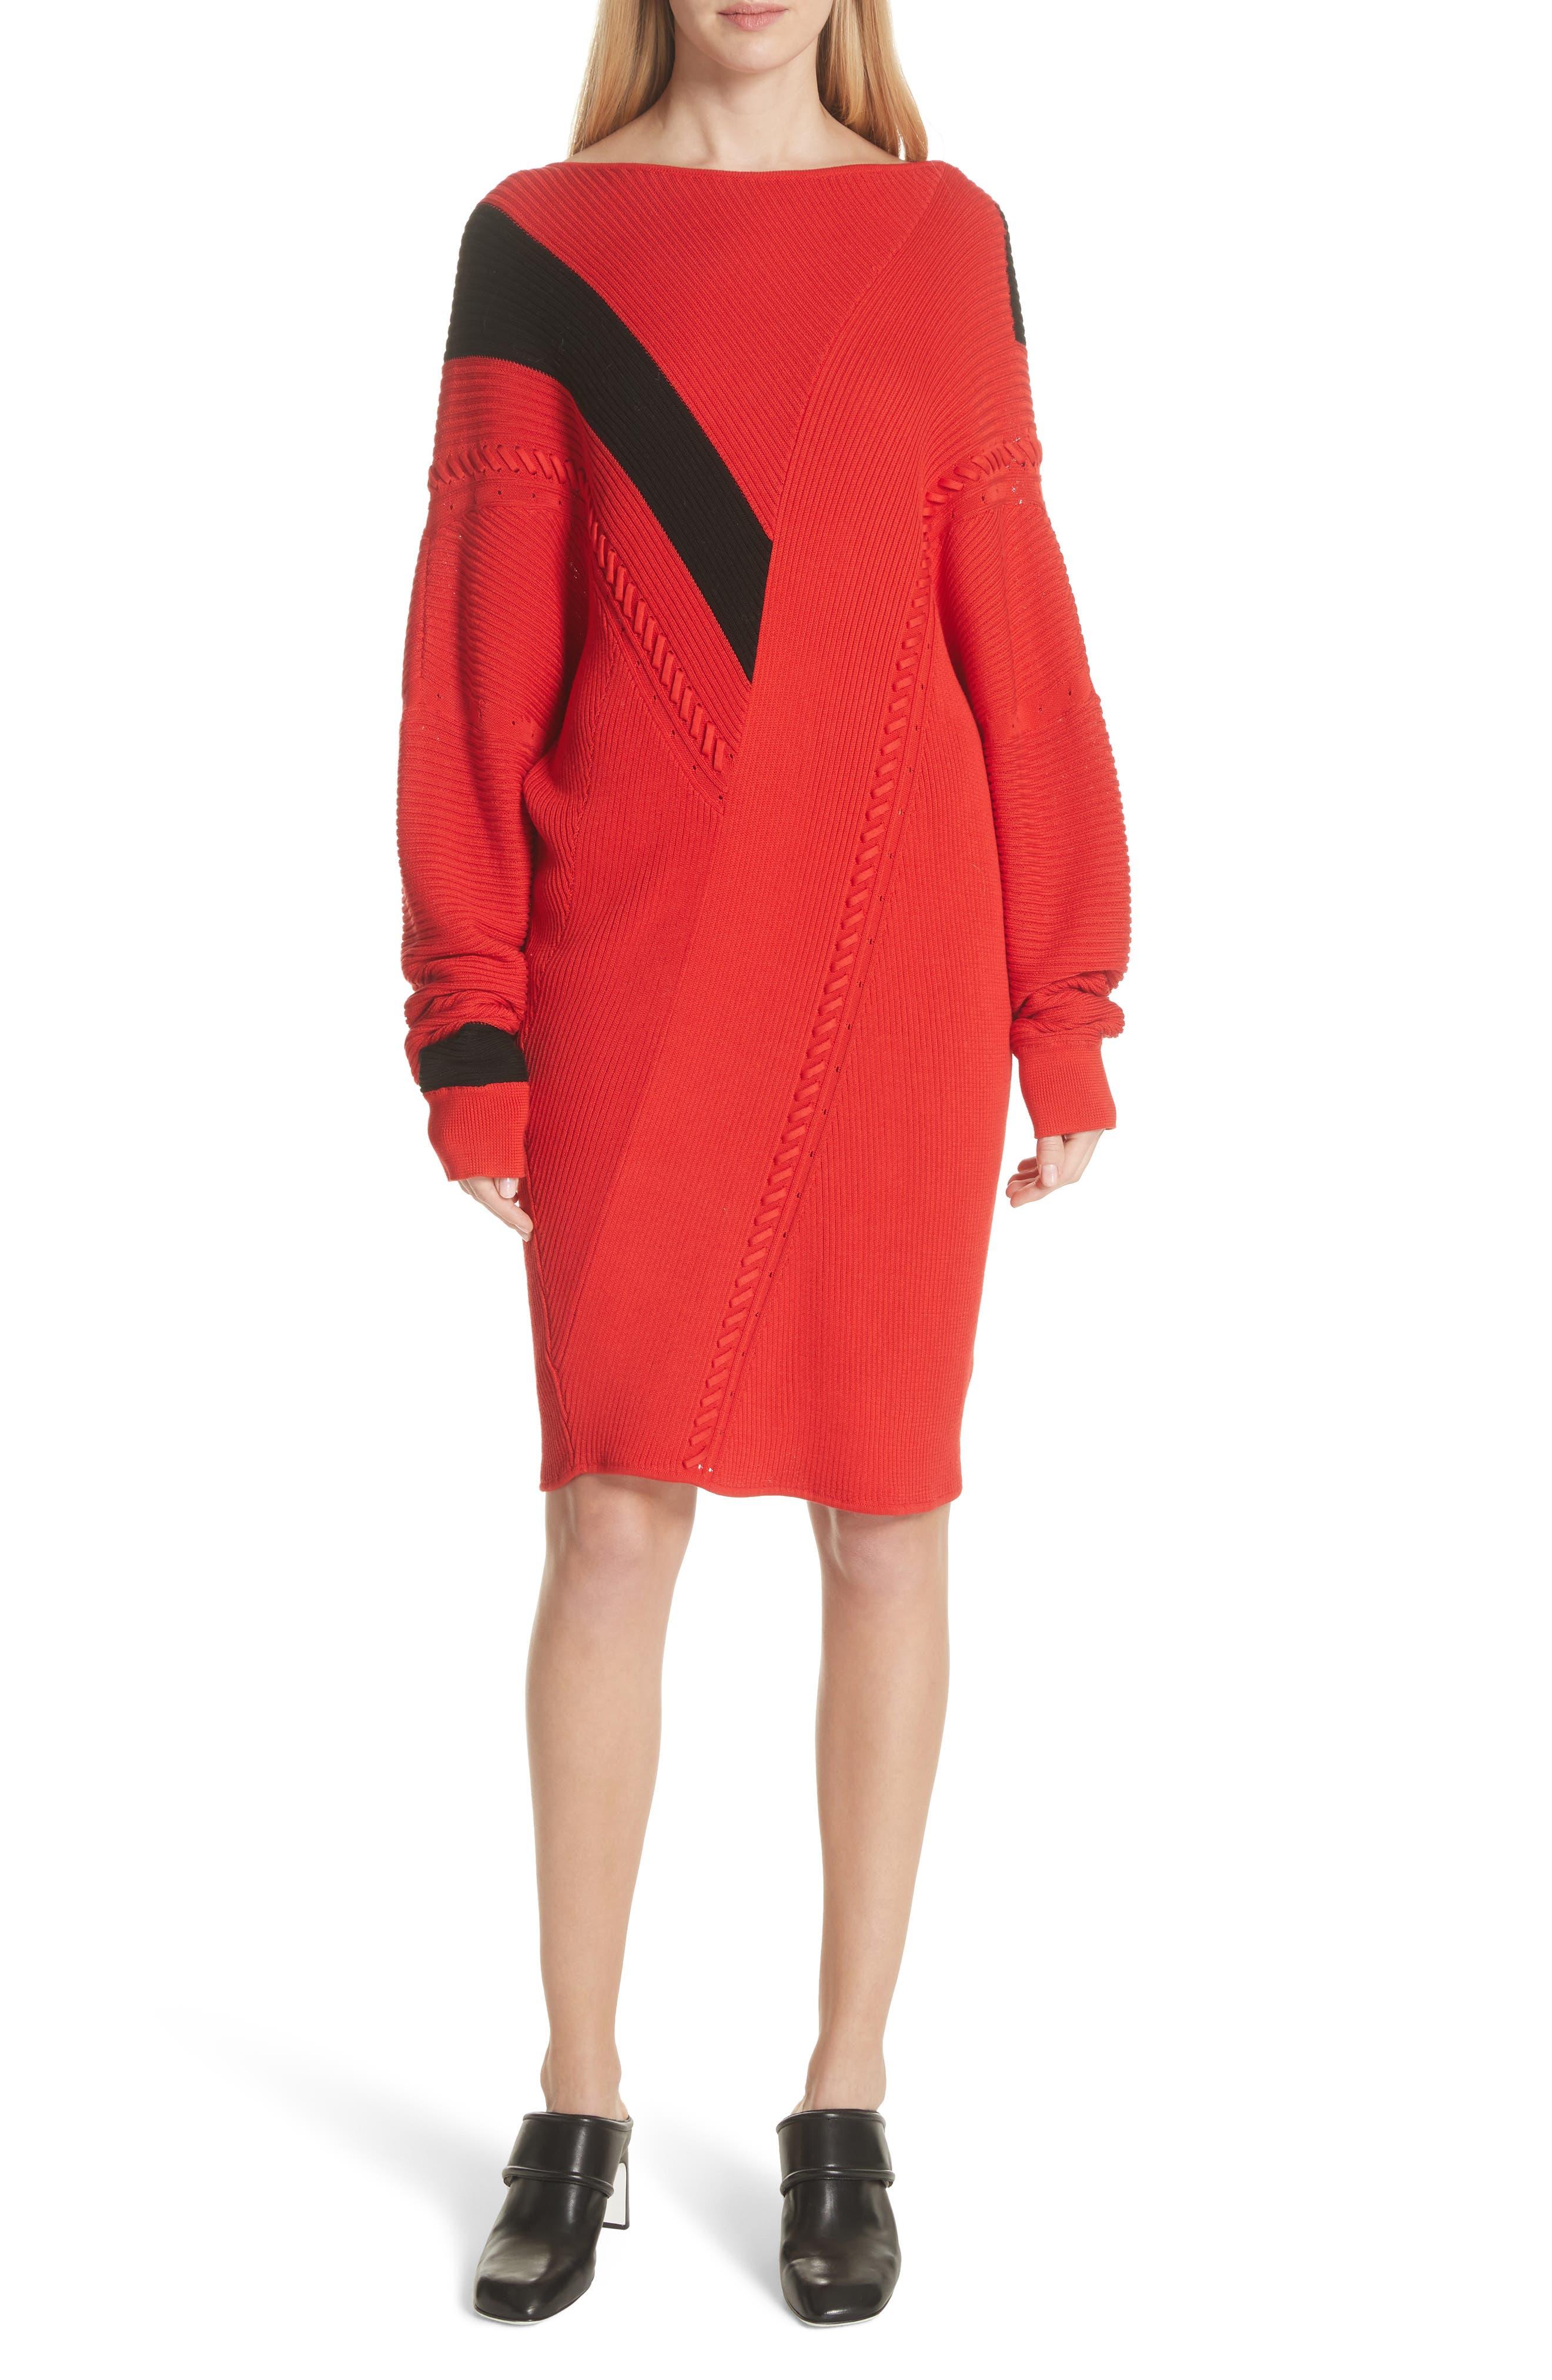 Cricket Reversible Sweater Dress,                             Main thumbnail 1, color,                             600